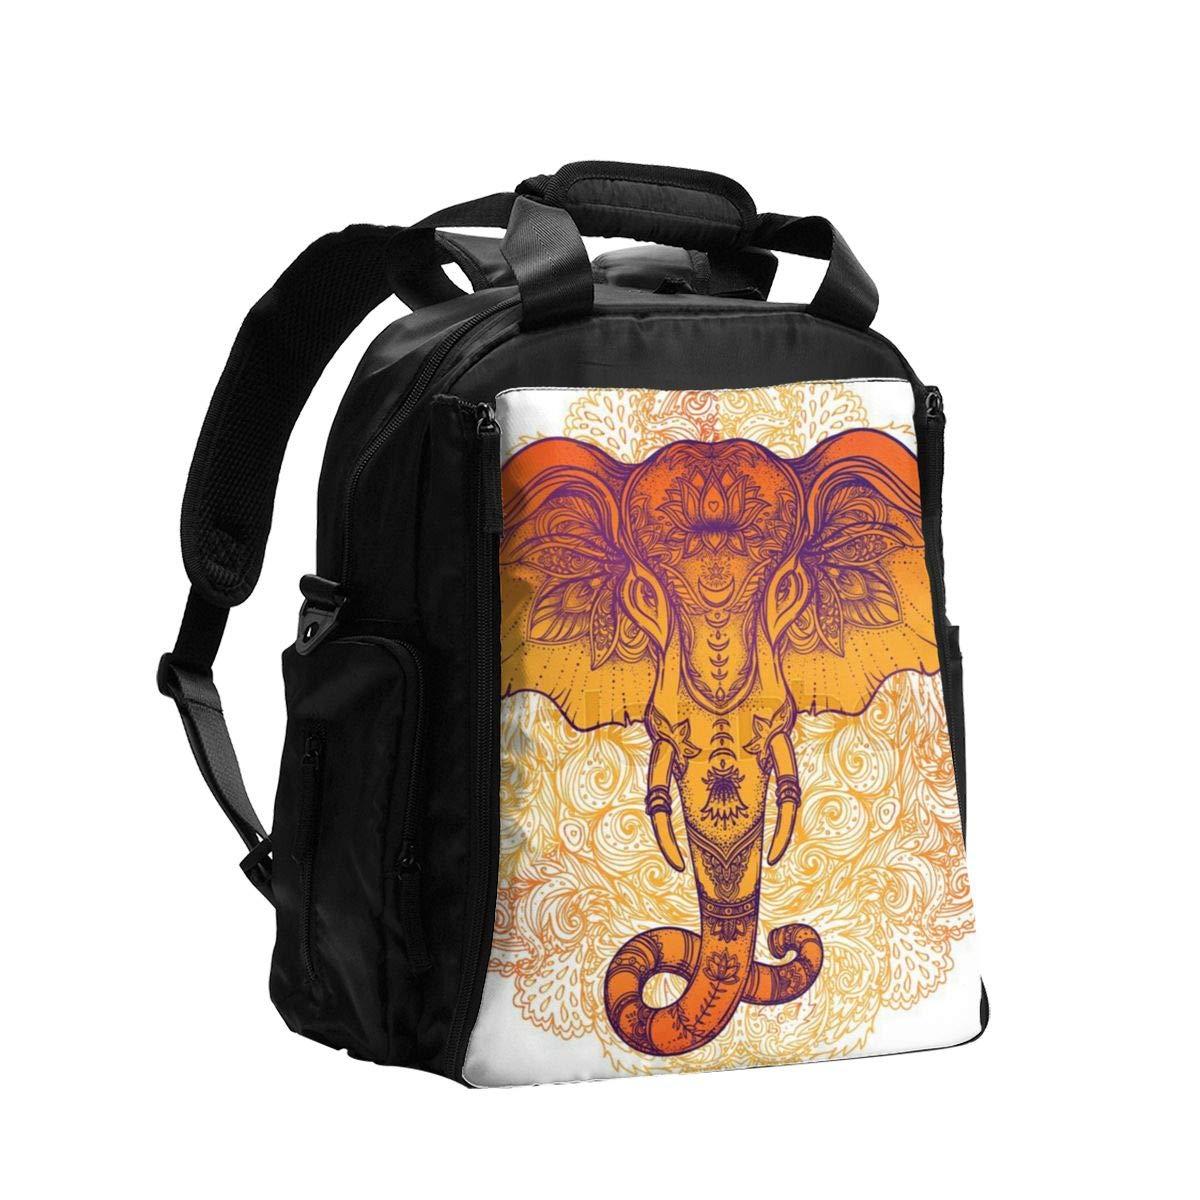 Diaper Bag Backpack Tribal Style Elephant Over Mandala Baby Diaper Bag,Diaper Bag